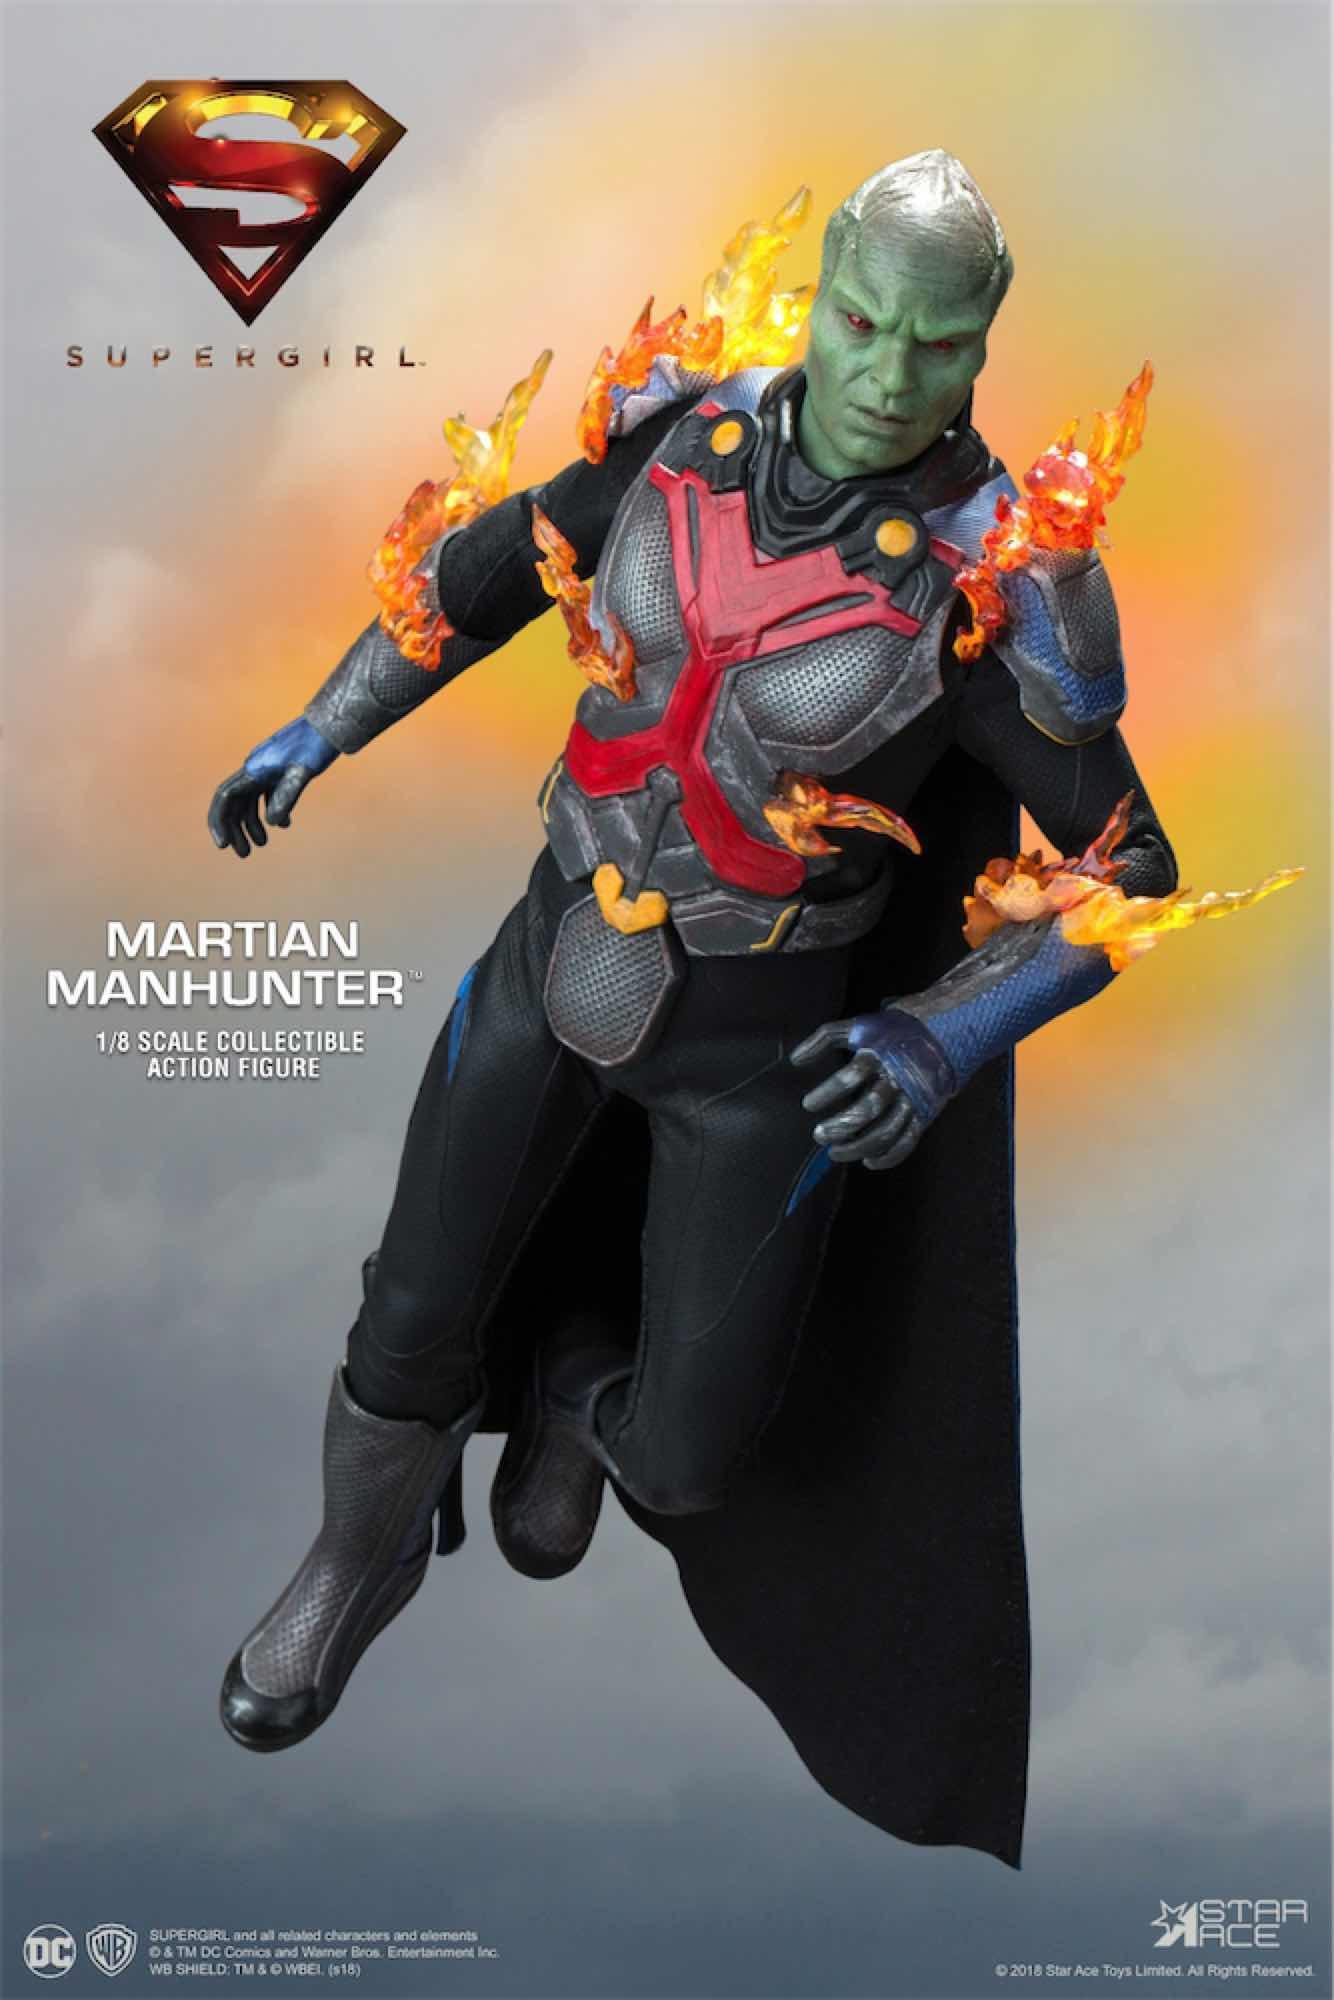 MARTIAN MANHUNTER VER. DELUXE FIGURA 22.5 CM SUPER GIRL TV 1/8 COLLECTIBLE ACTION FIGURE